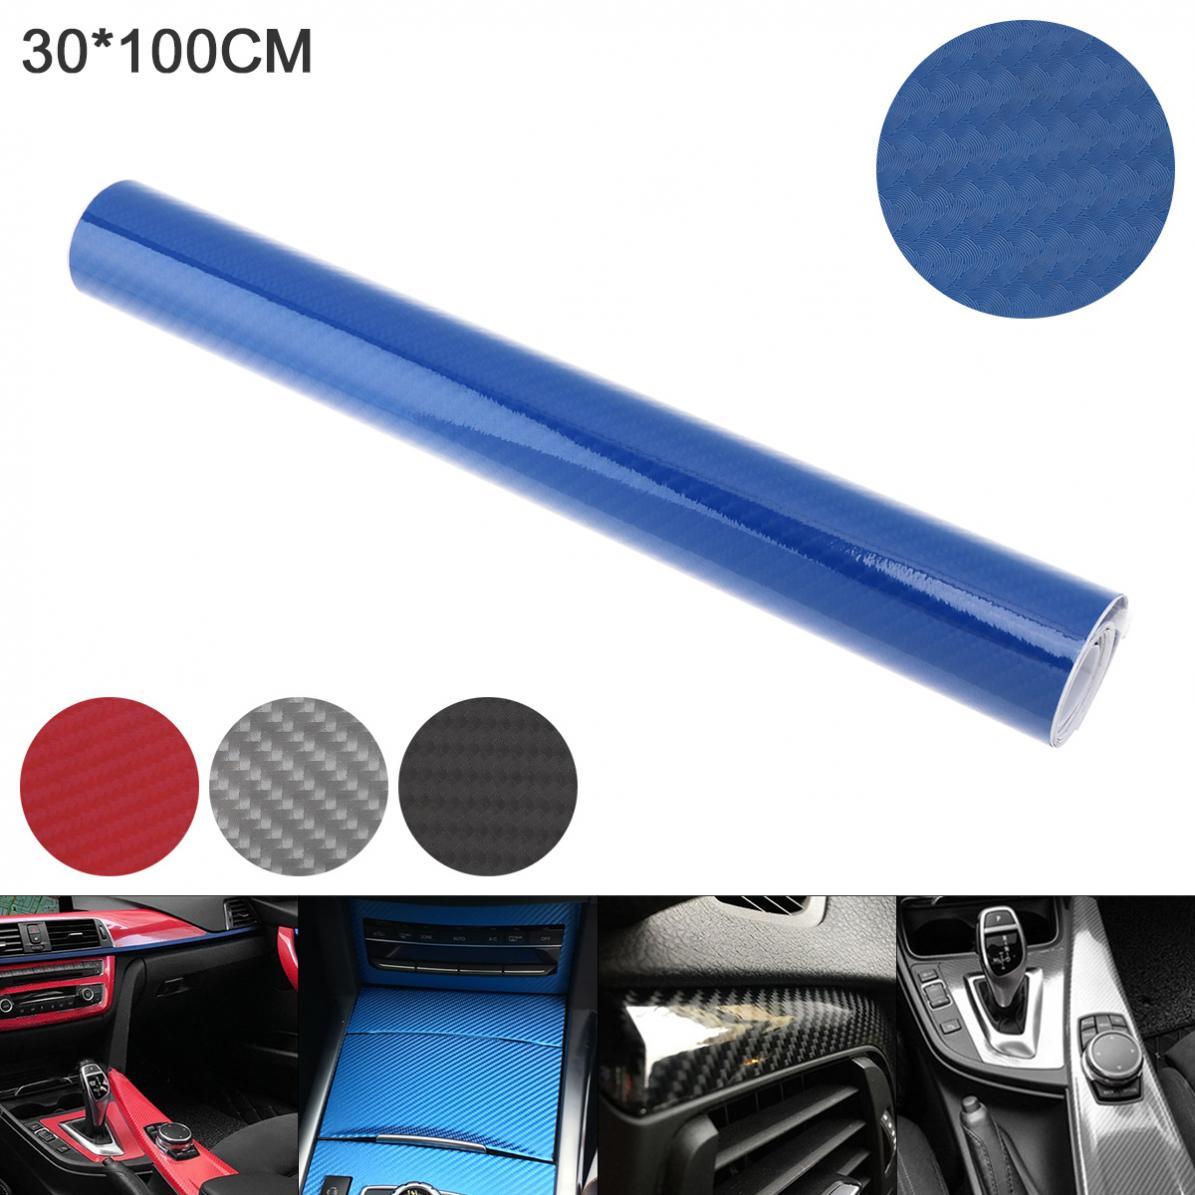 4 colores, 30x100cm, PVC, fibra de carbono 6D, pegatina de reembalaje de alto brillo para automóvil, apto para coche, motocicleta, producto electrónico, hogar